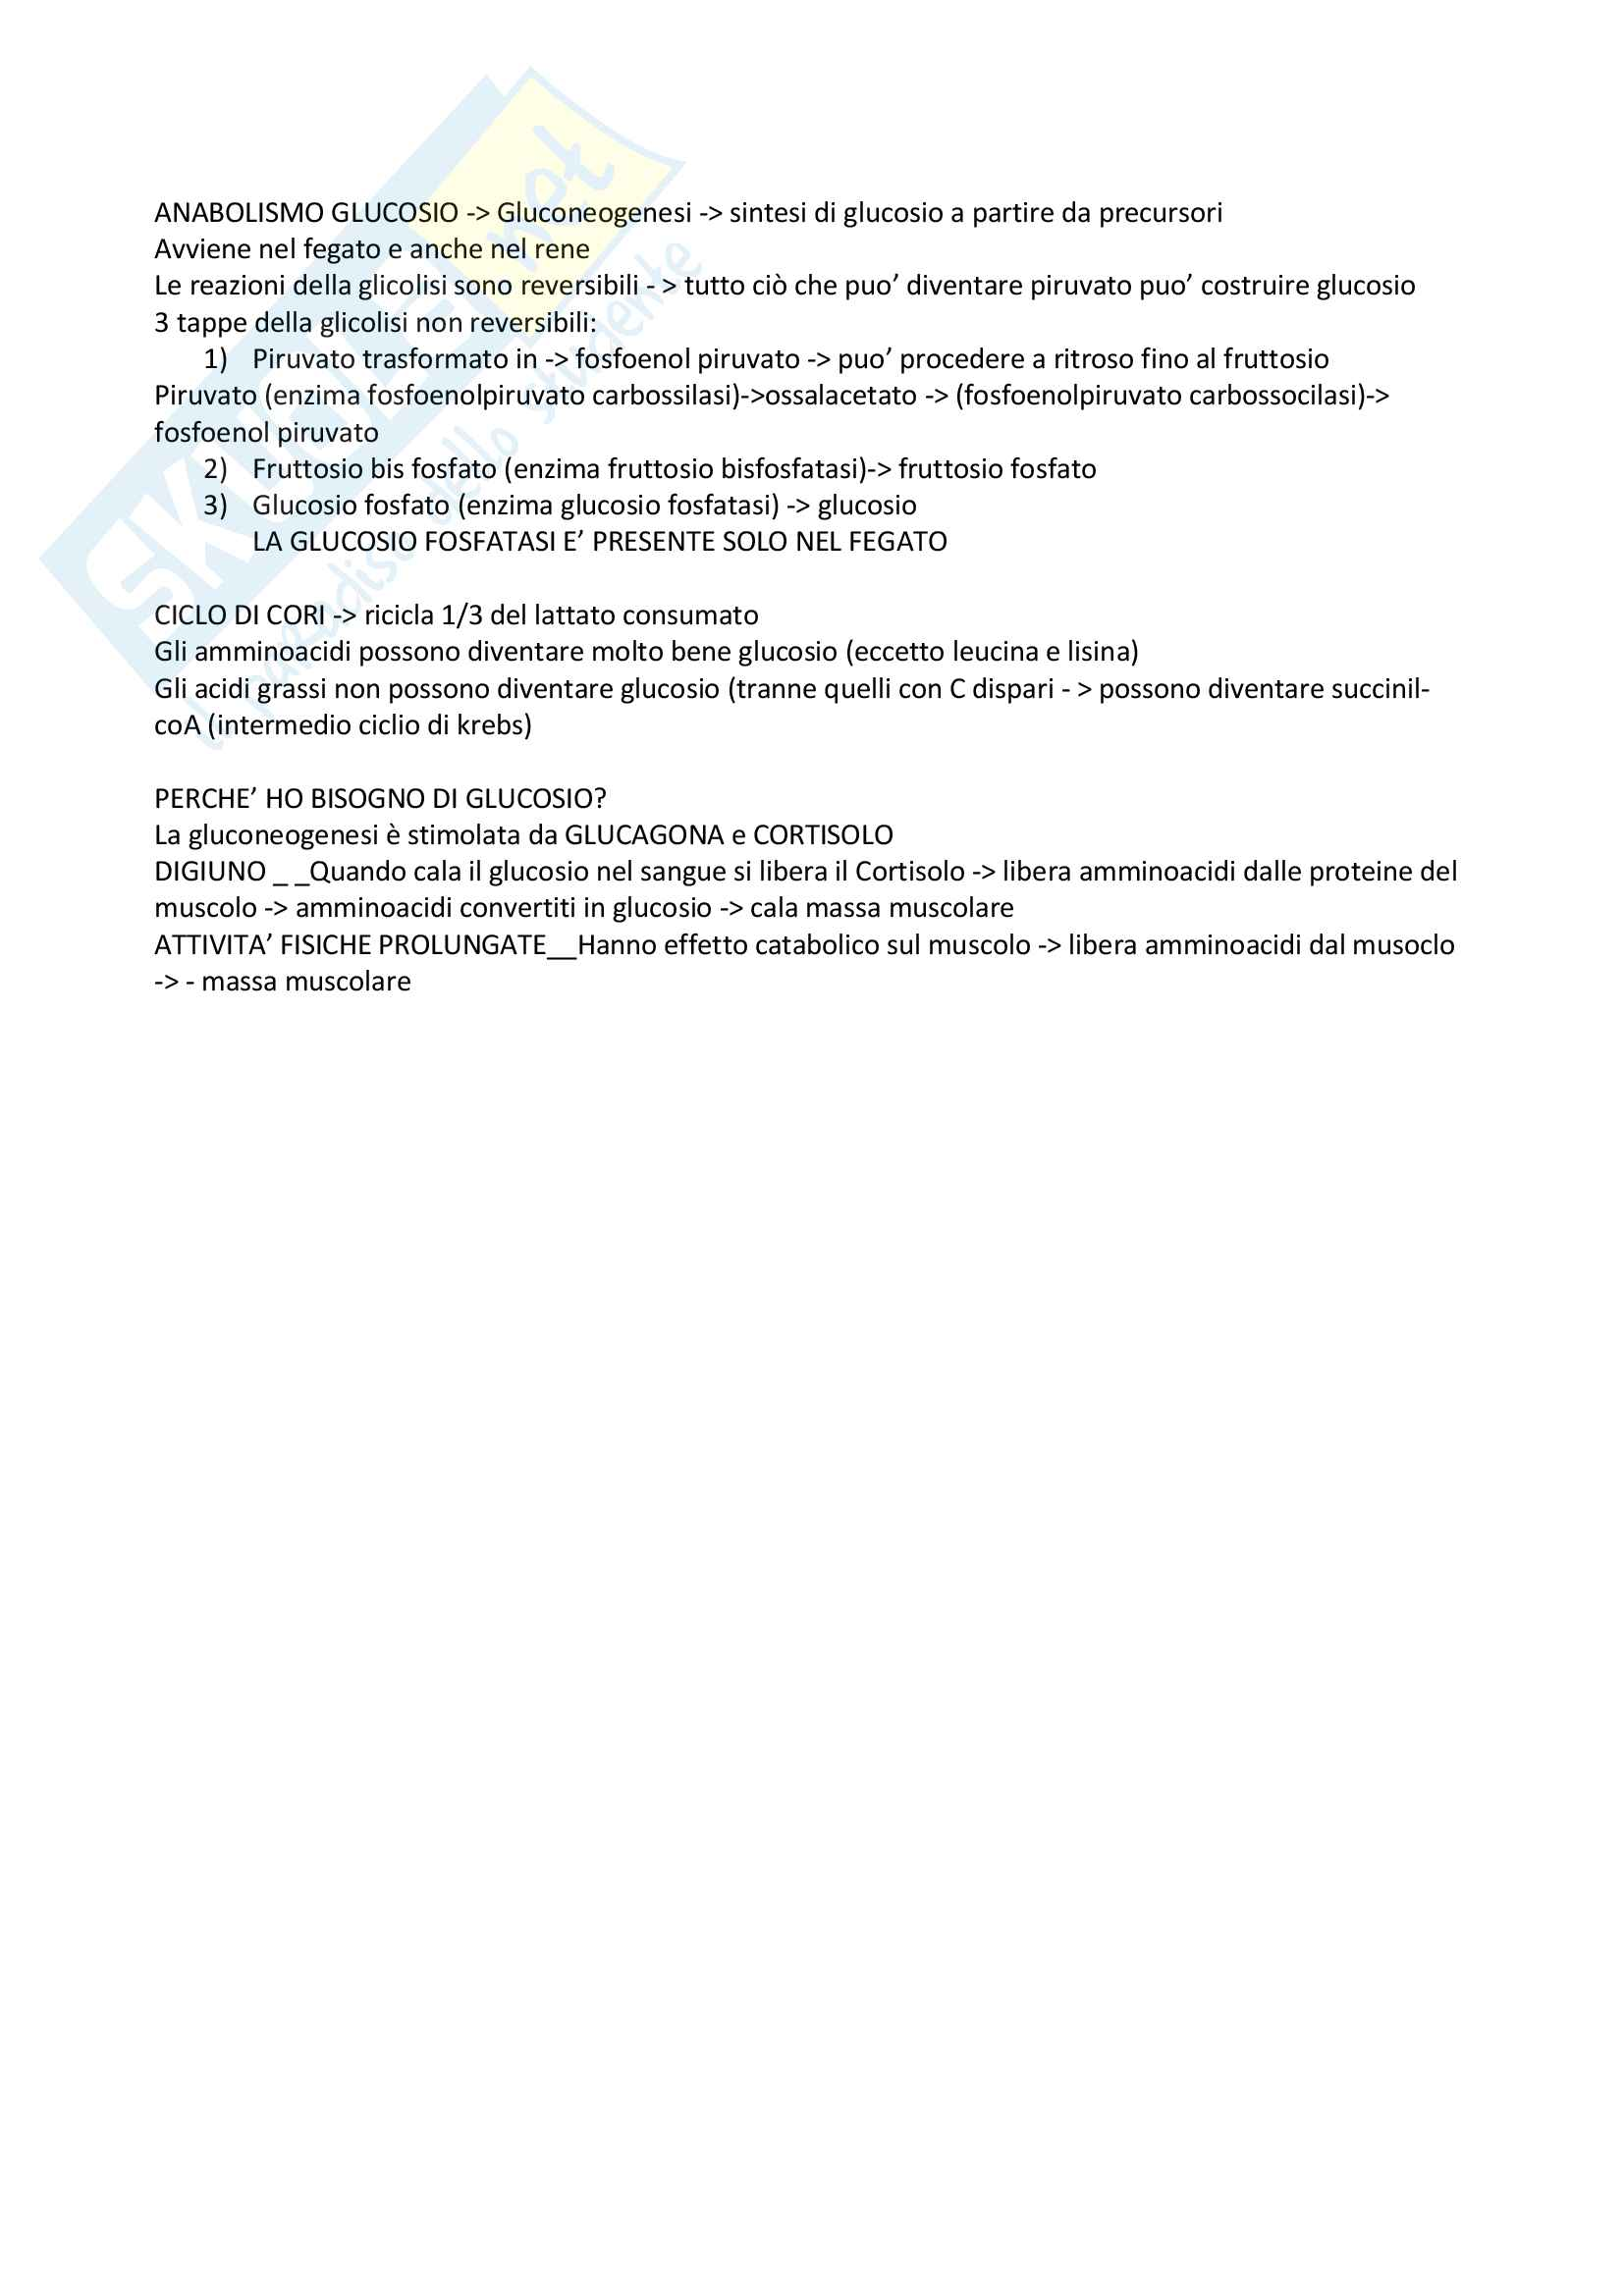 Biochimica Metabolica, prof. Stefanelli